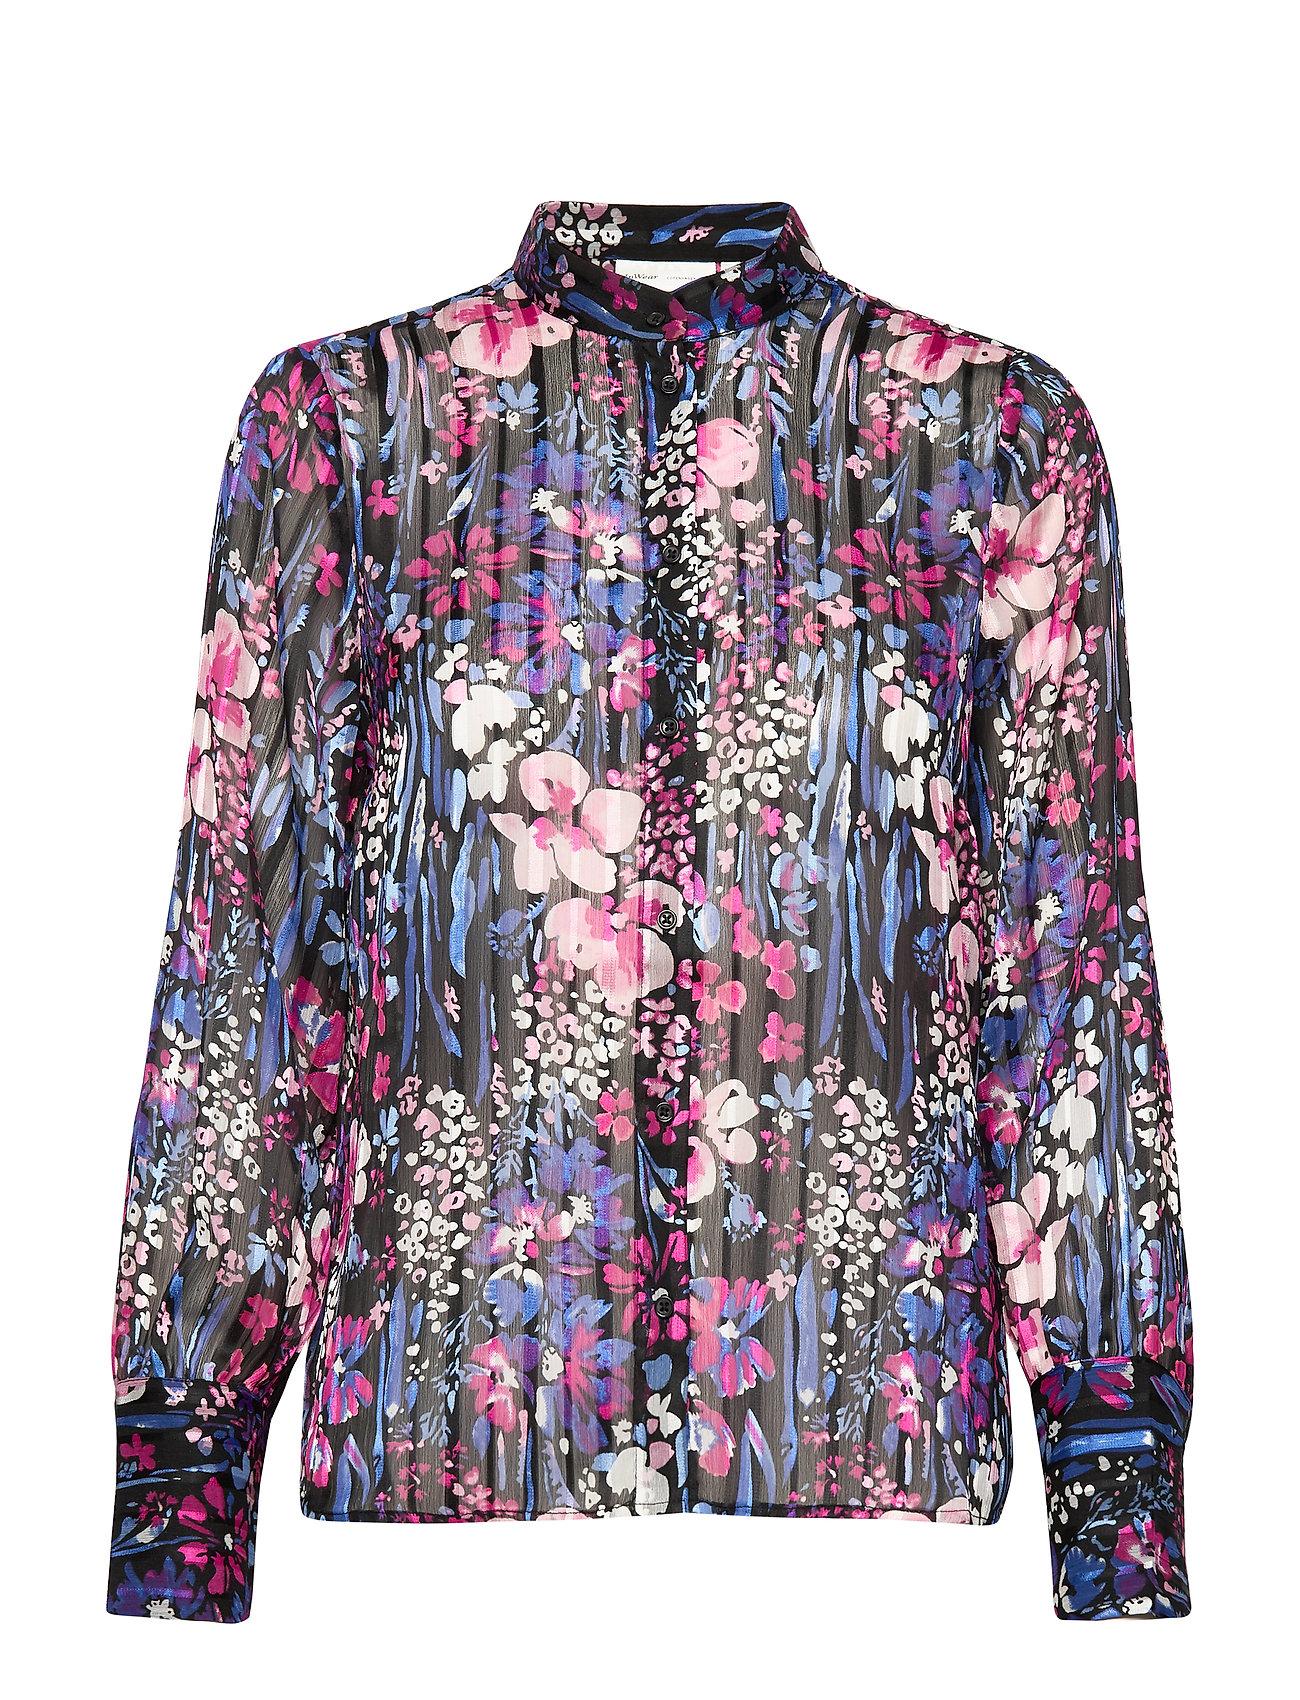 InWear LondonIW Shirt - BLACK FLOWER EXPLOSION